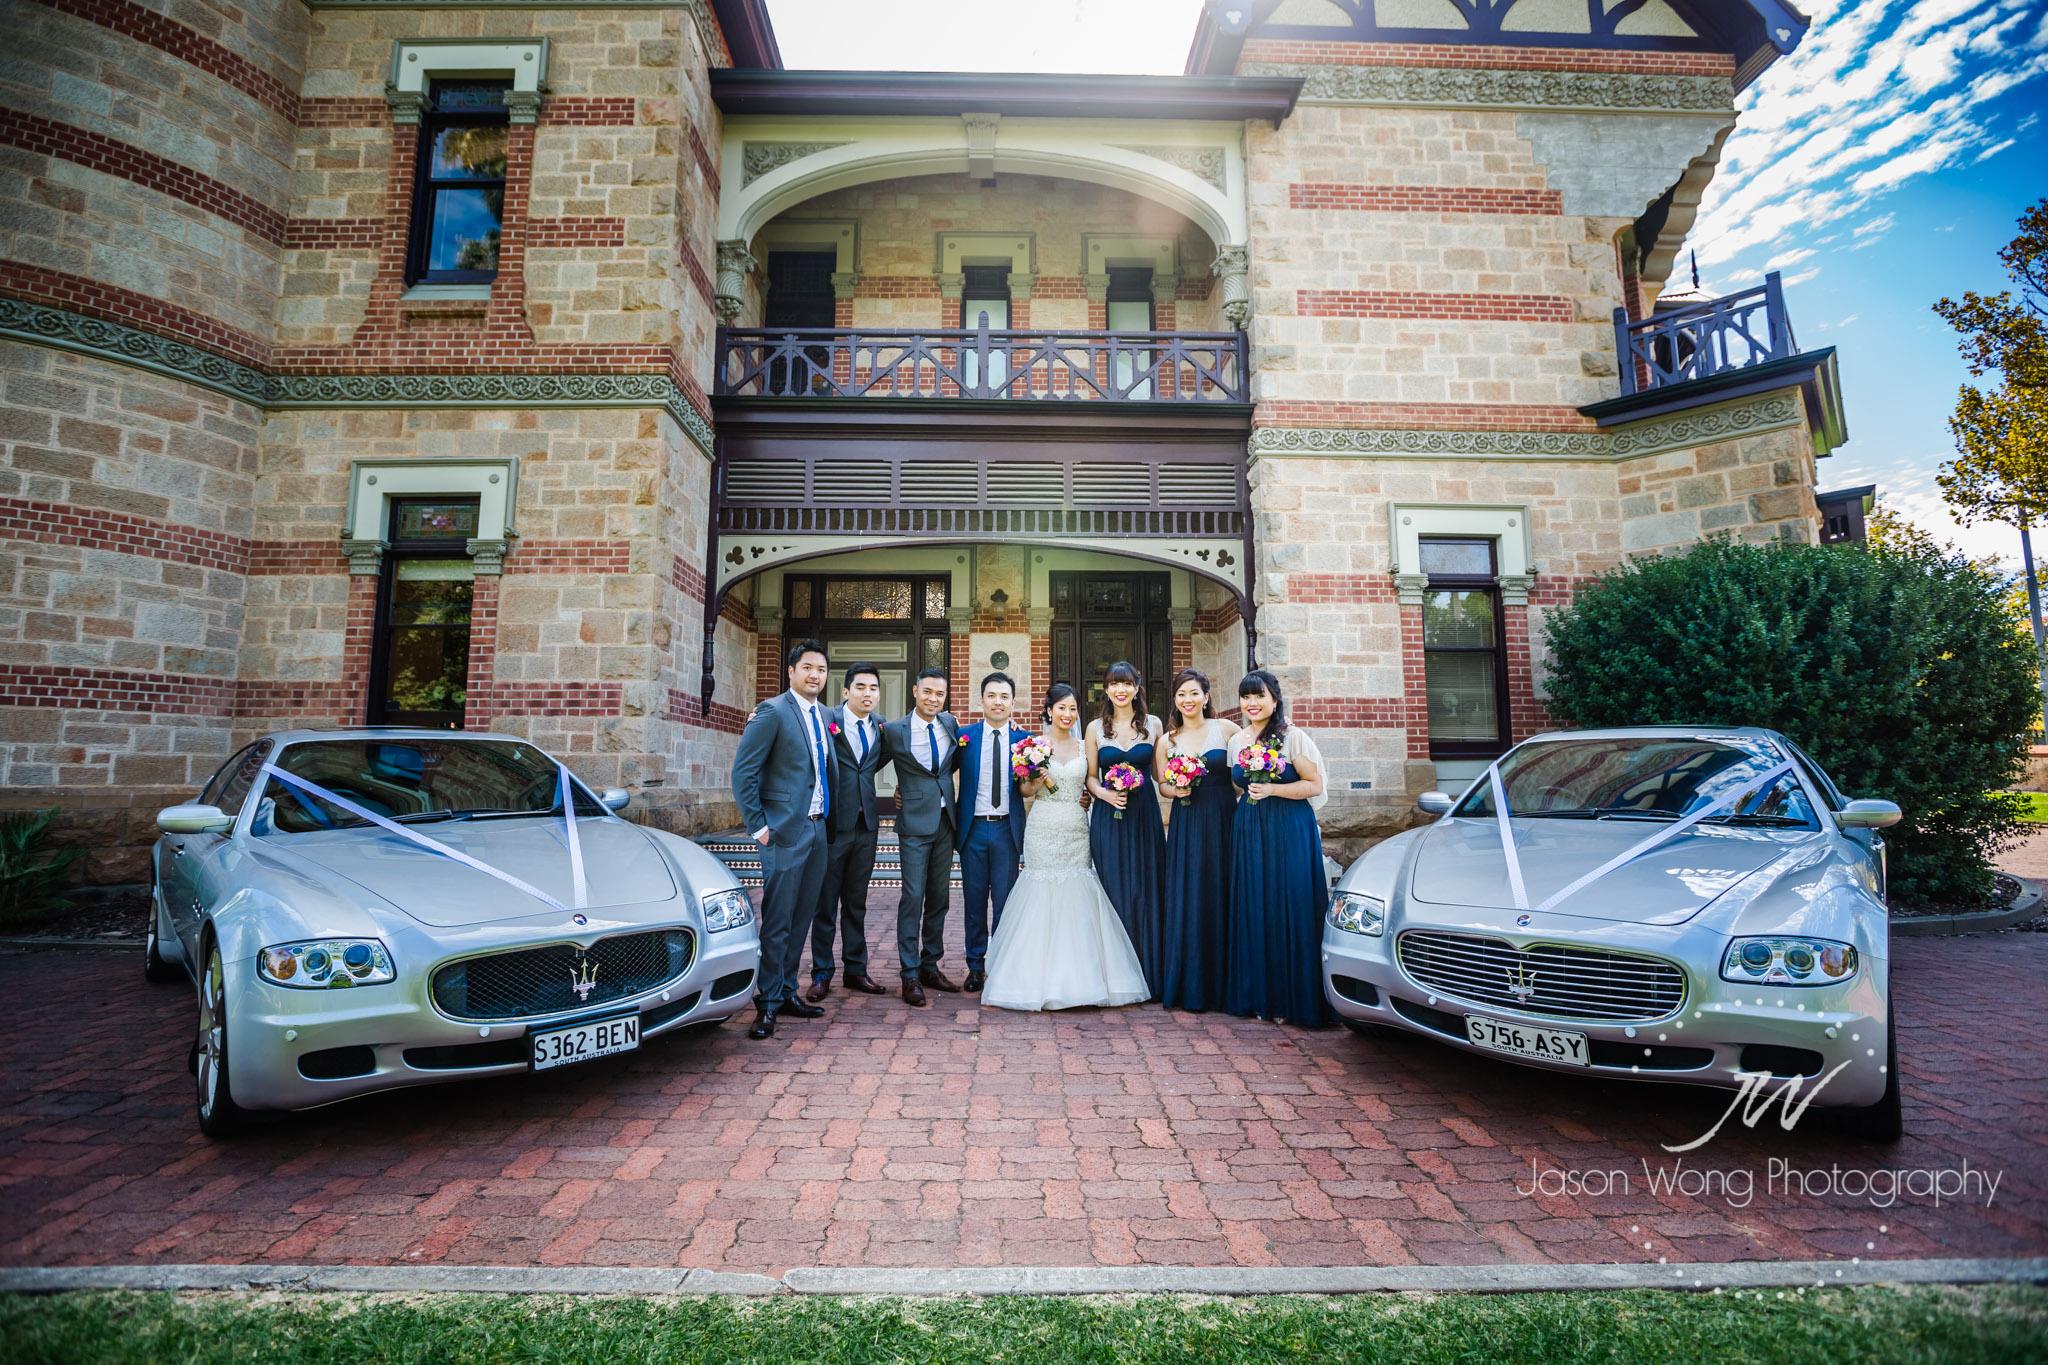 wedding-car-and-bridal-party.jpg